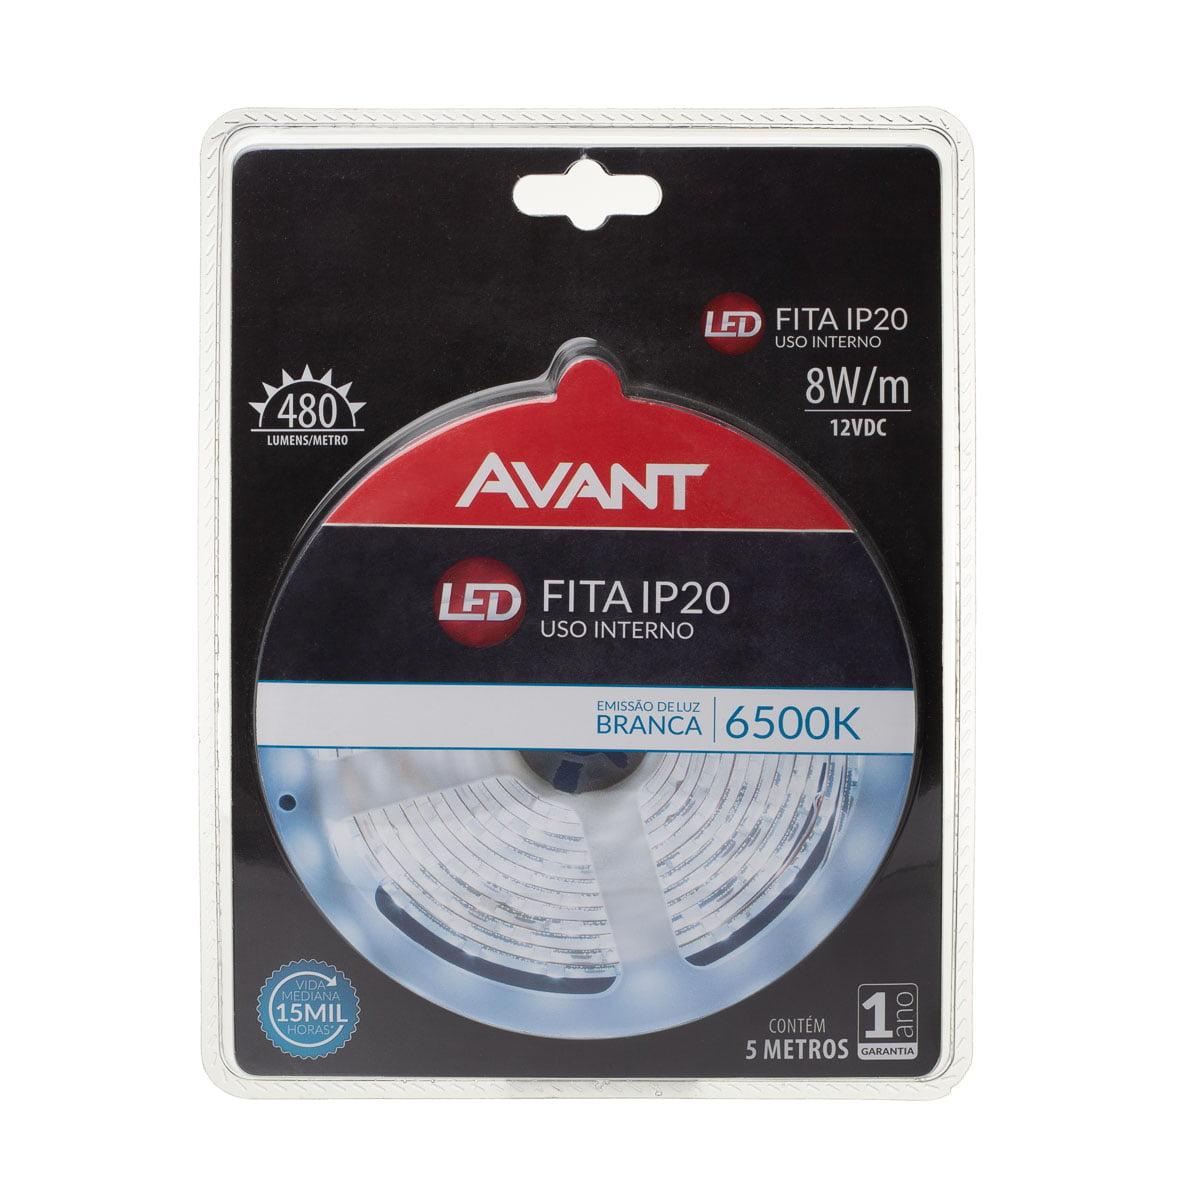 FITA DE LED SMD3528 12V IP20 8W/M ROLO 5M 6500K AVANT